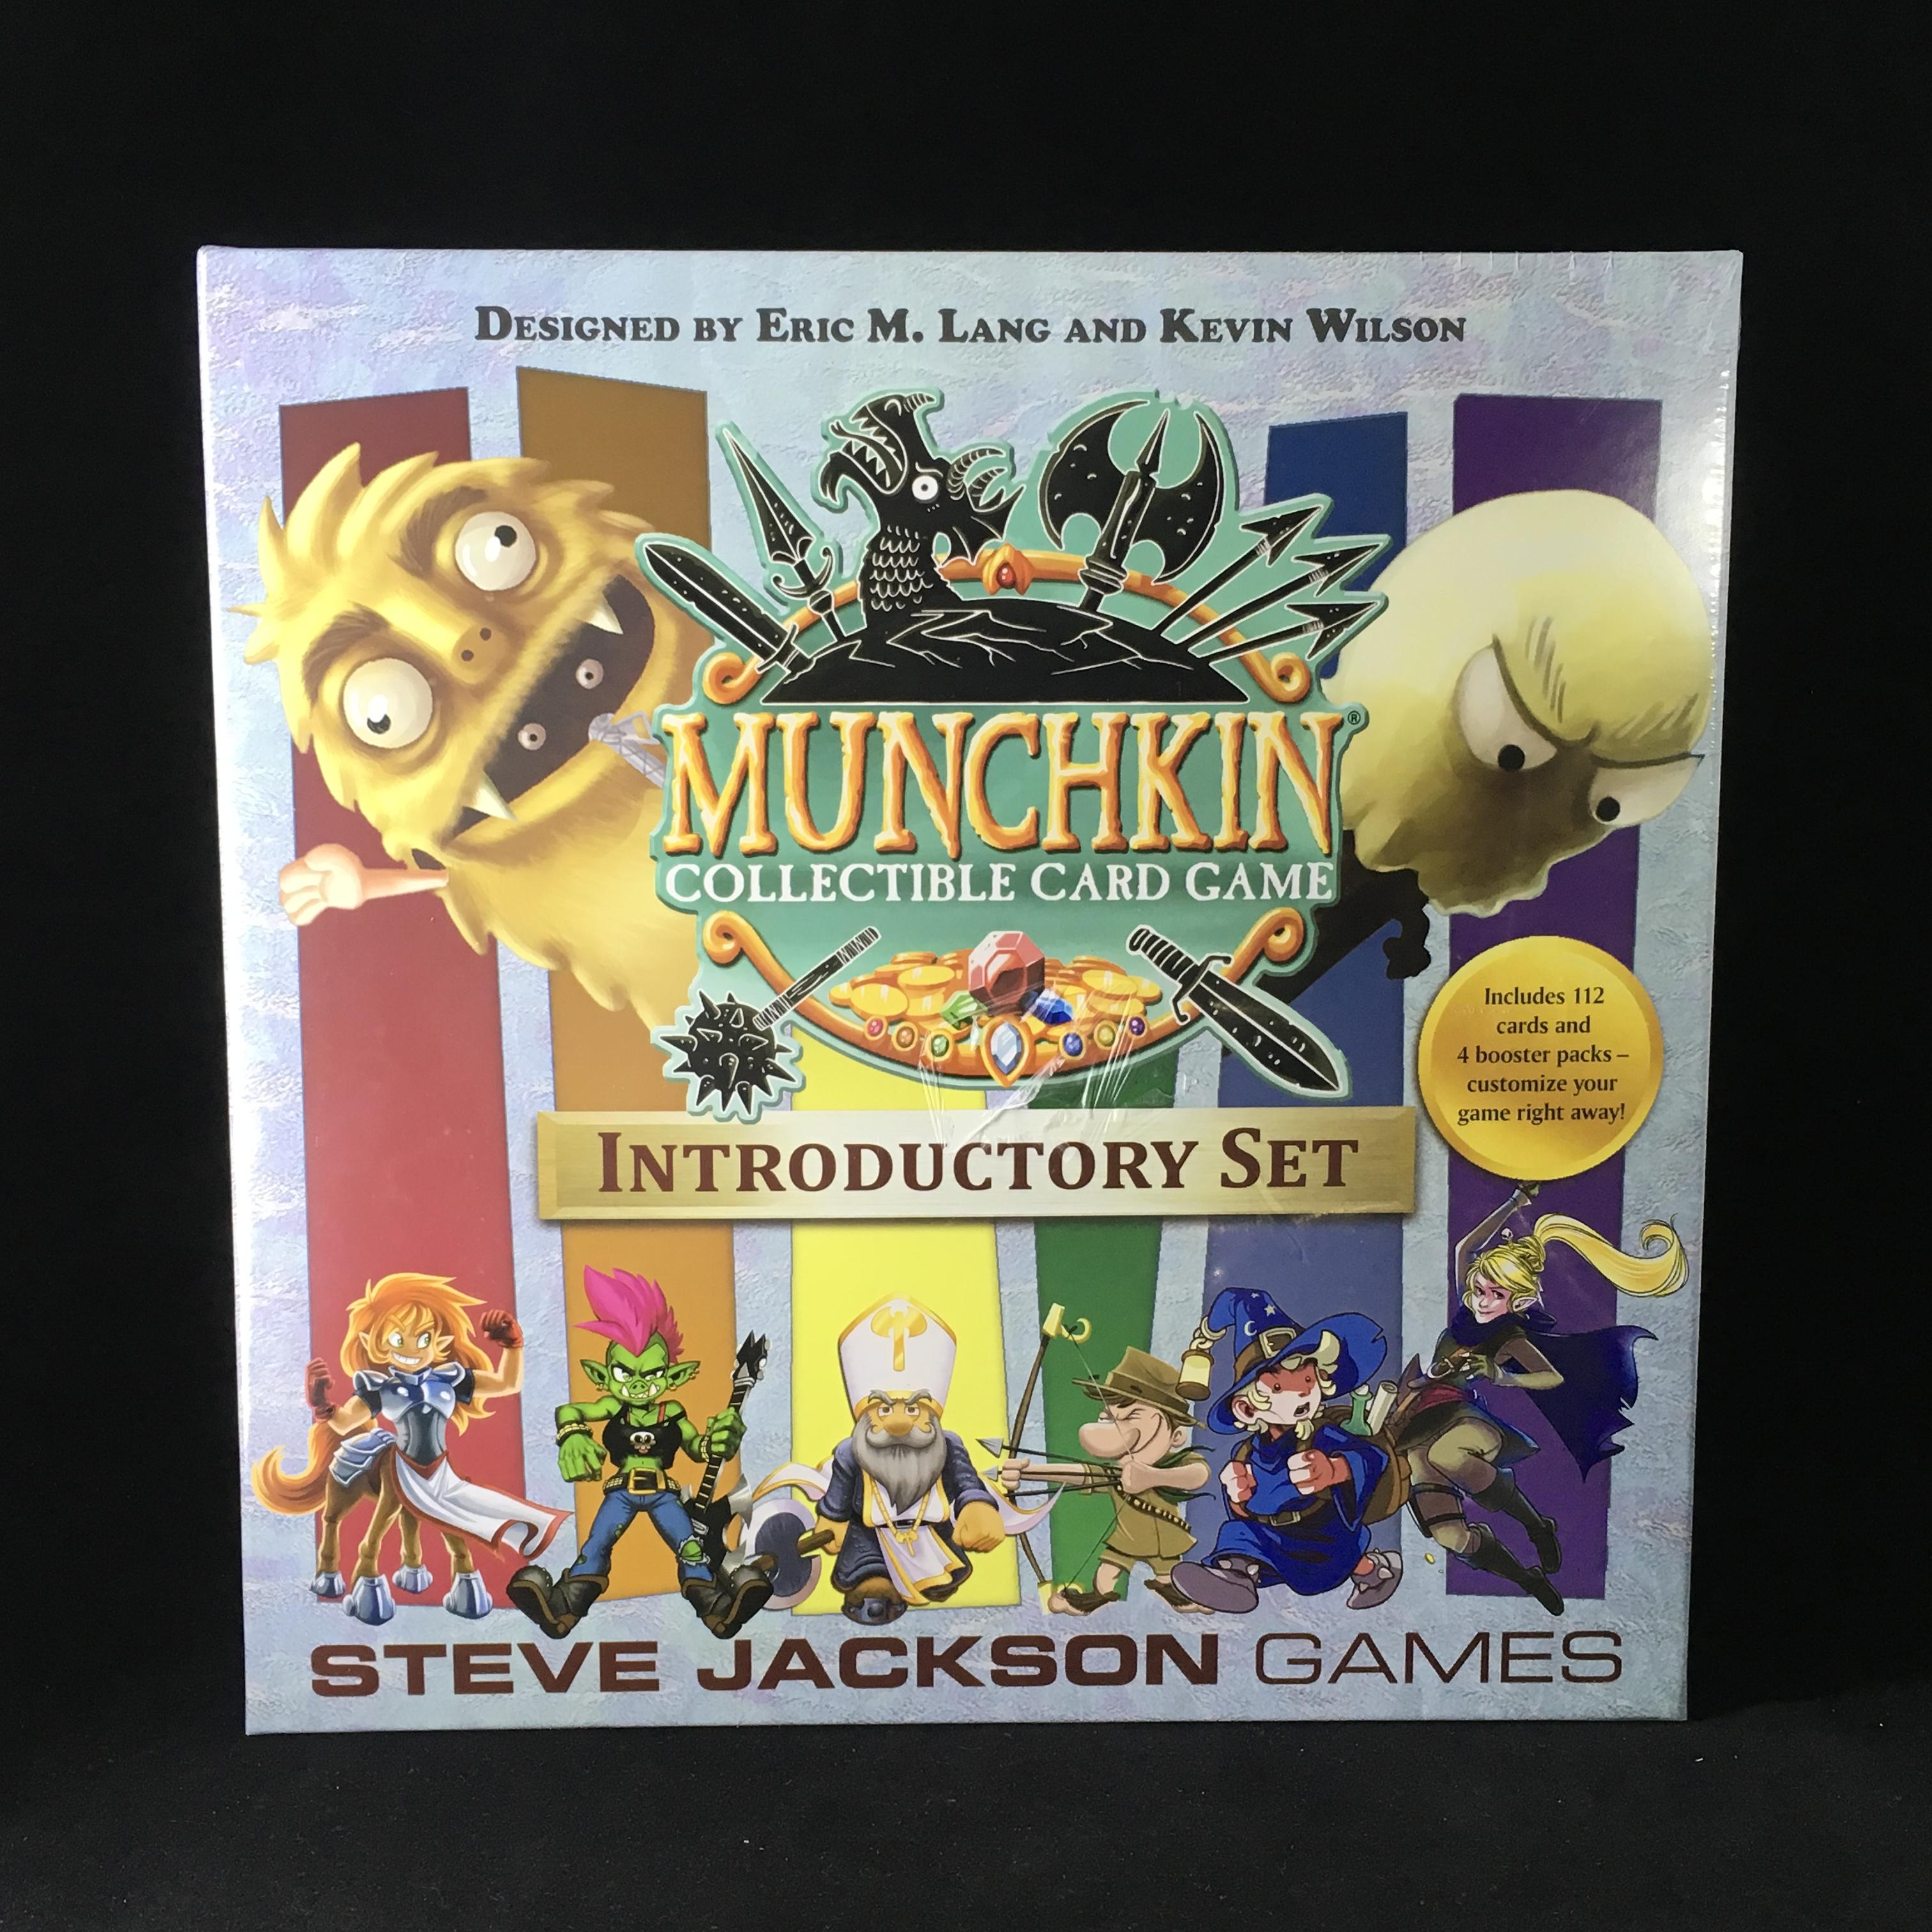 Munchkin Penny Arcade Expansion 2012 Steve Jackson Games